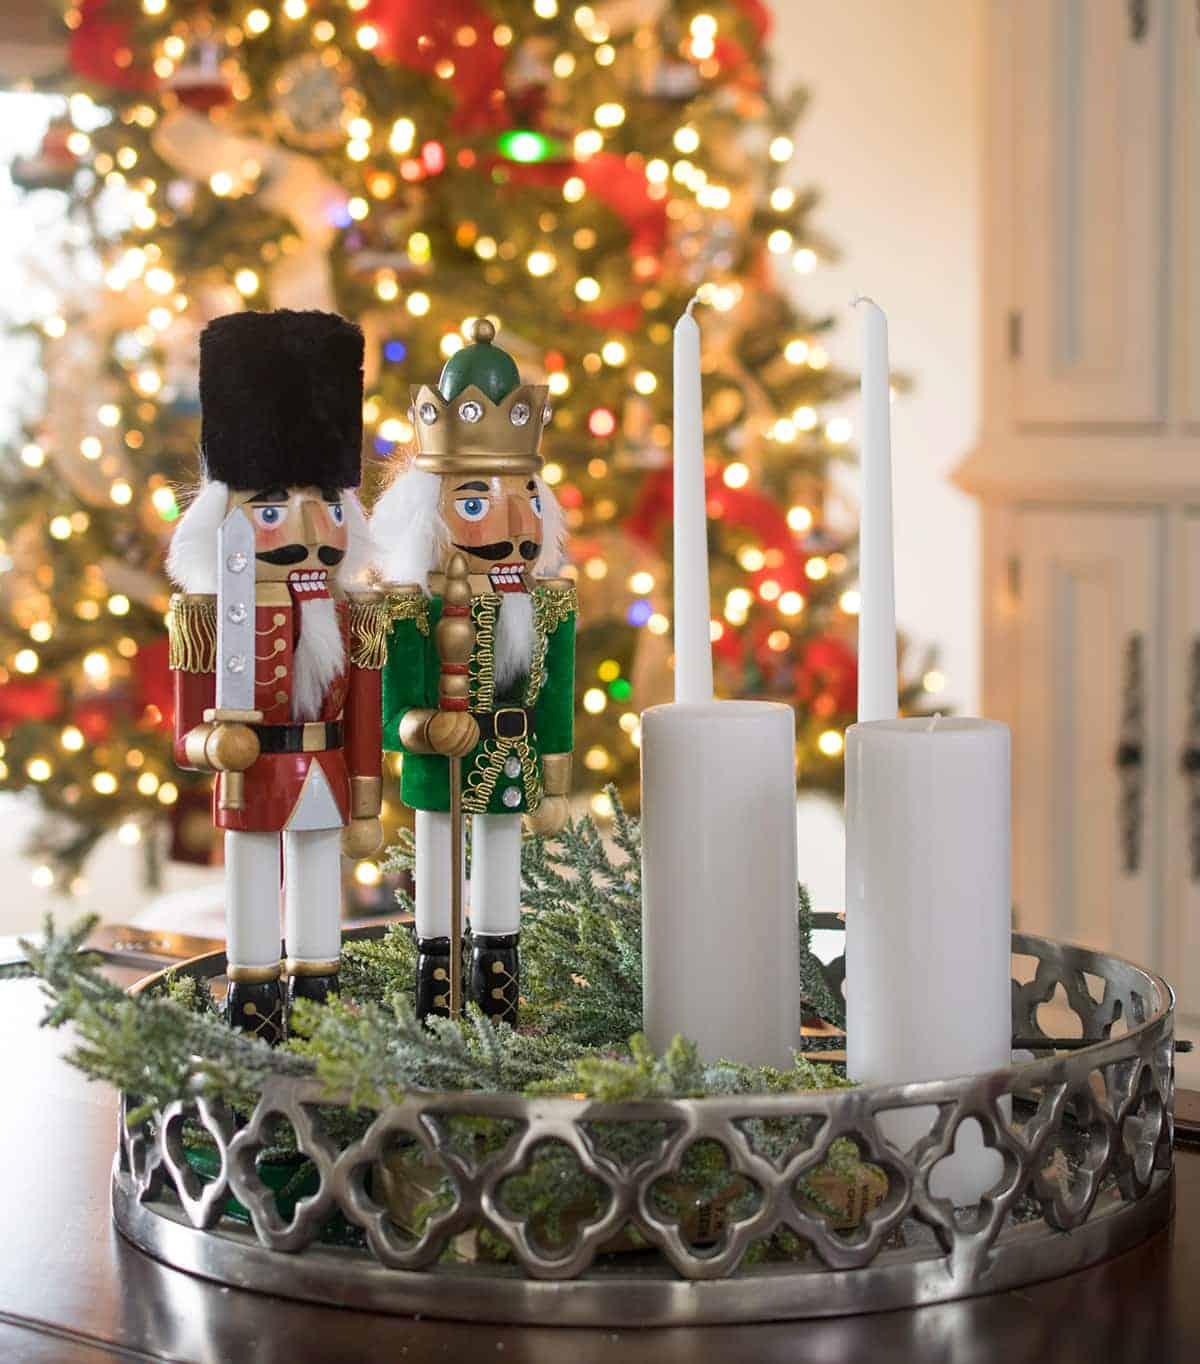 Nutcracker coffee table centerpiece - cheap Christmas decorating ideas